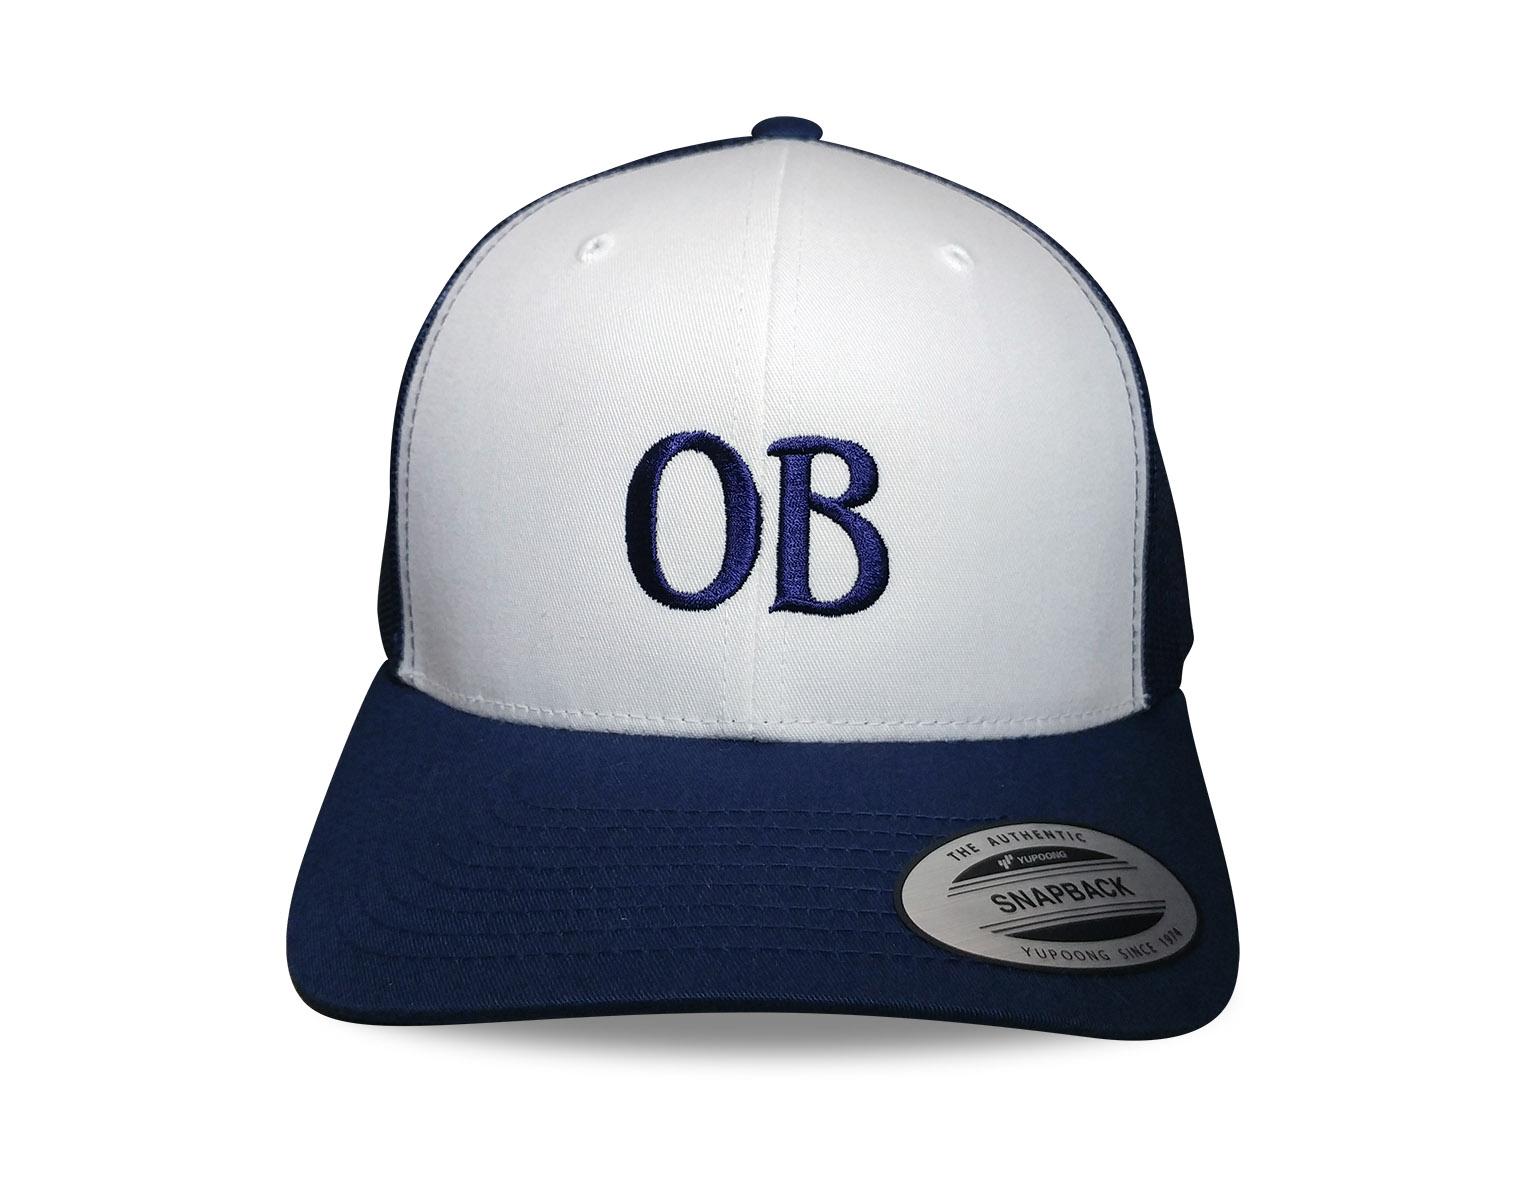 Ocean Beach Product: OB Trucker Hat